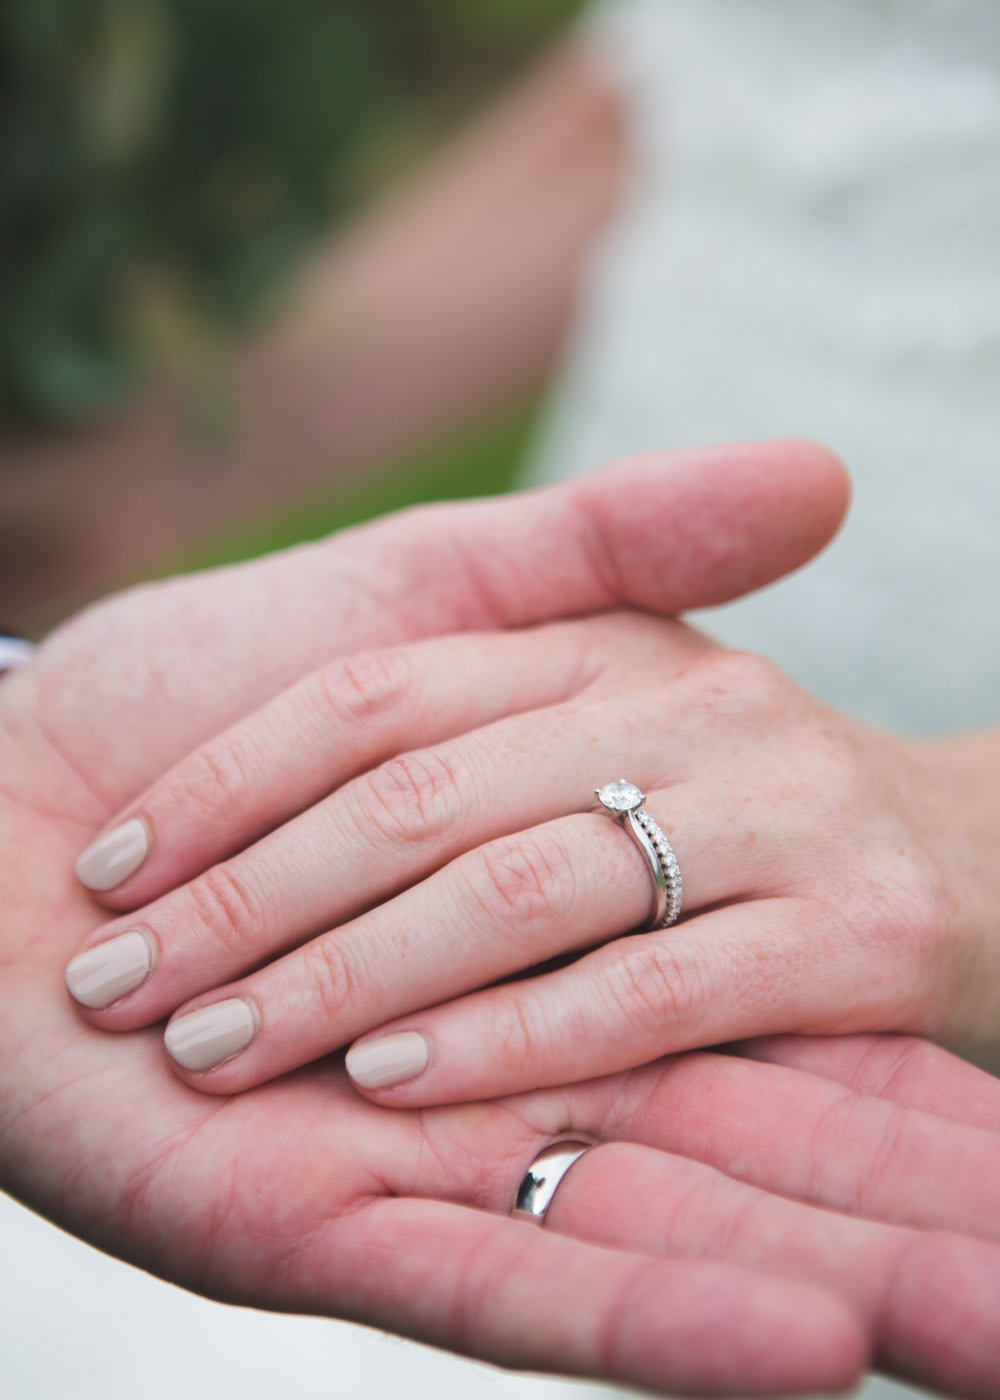 Rings Bands Engagement Diamond Solitaire Airbnb Wedding Pickavance Weddings